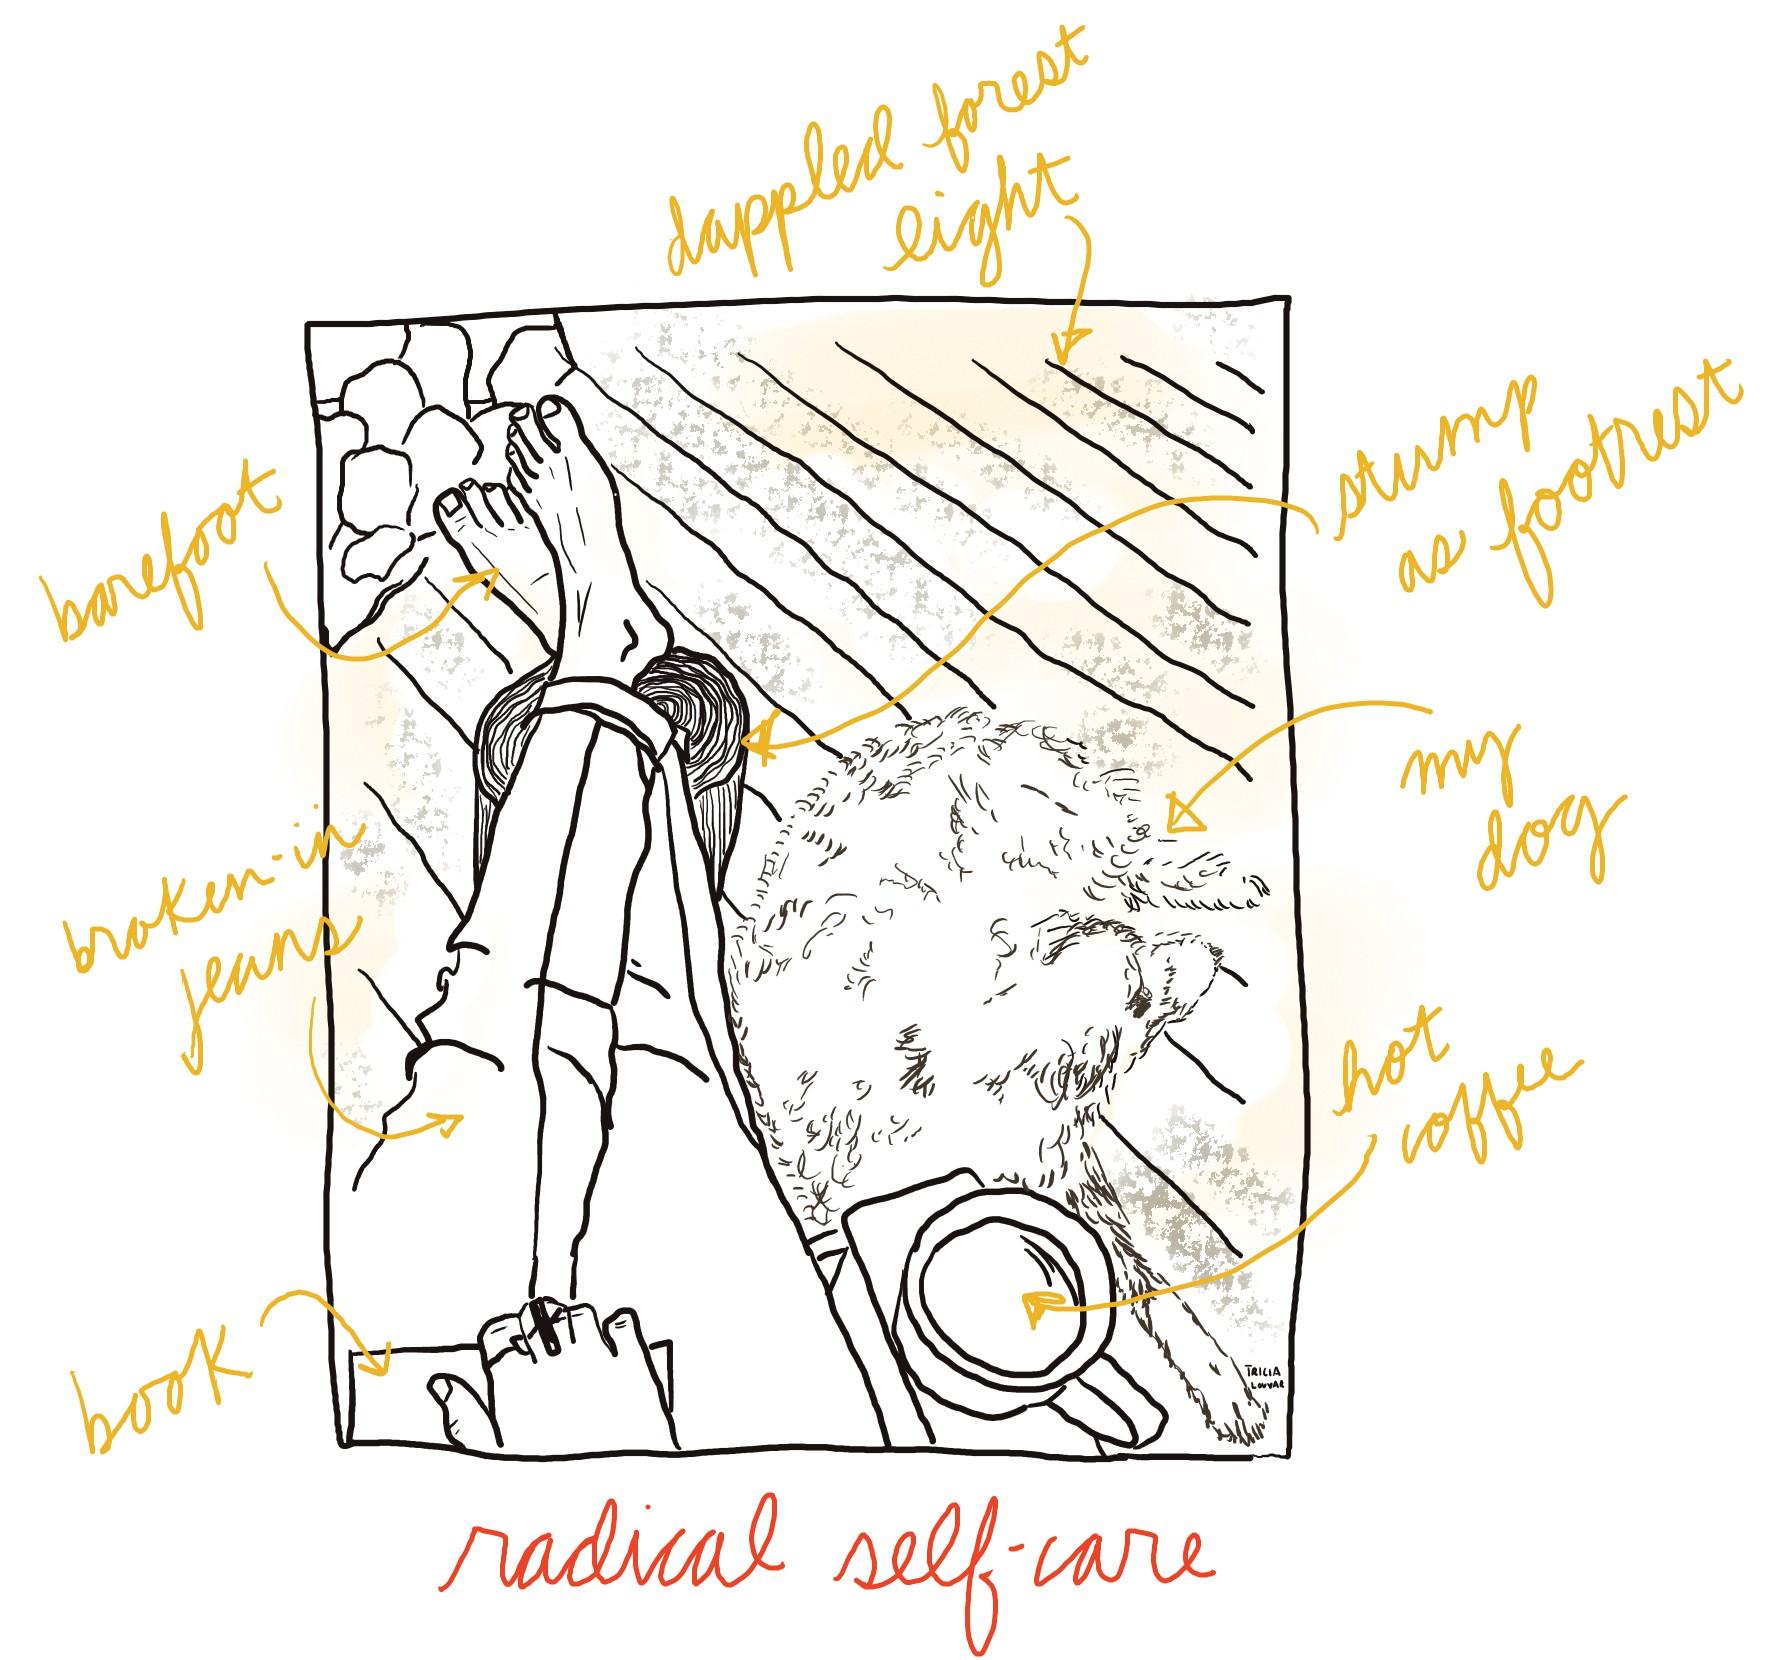 radical self-care: one scene. 2019